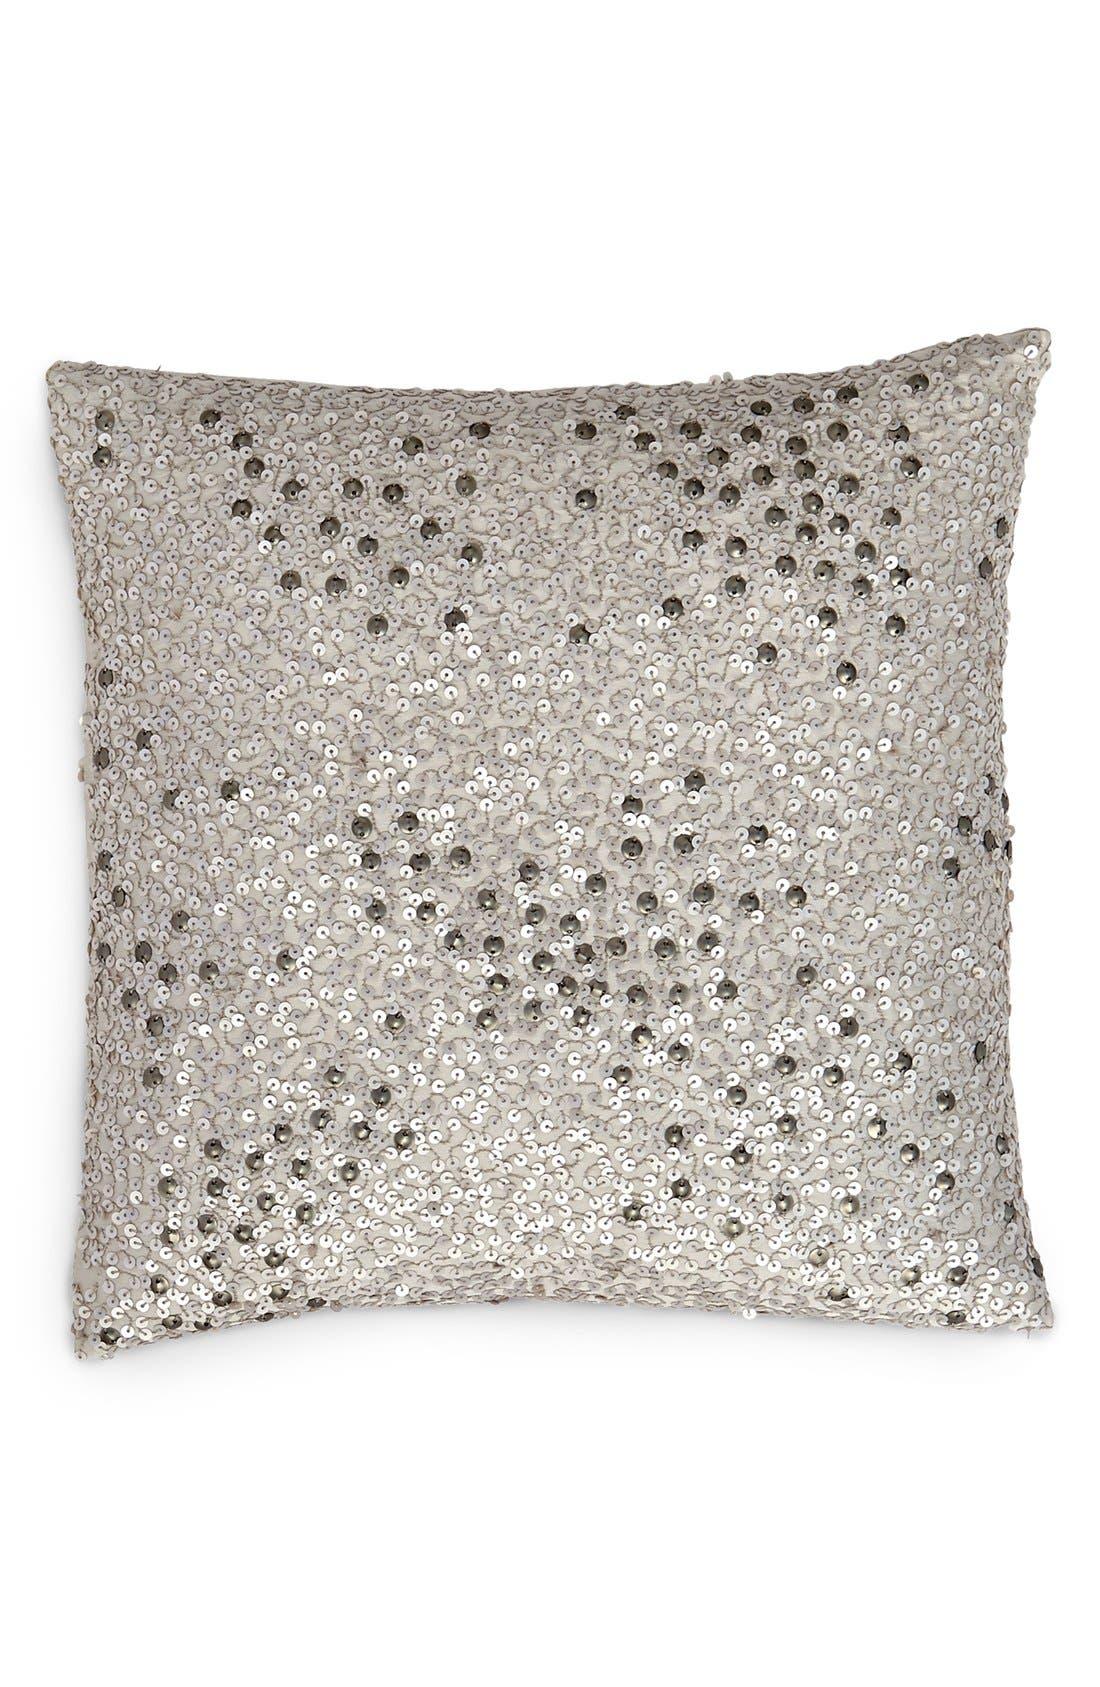 DONNA KARAN NEW YORK, Donna Karan Collection 'Reflection' Sequin Pillow, Main thumbnail 1, color, SILVER